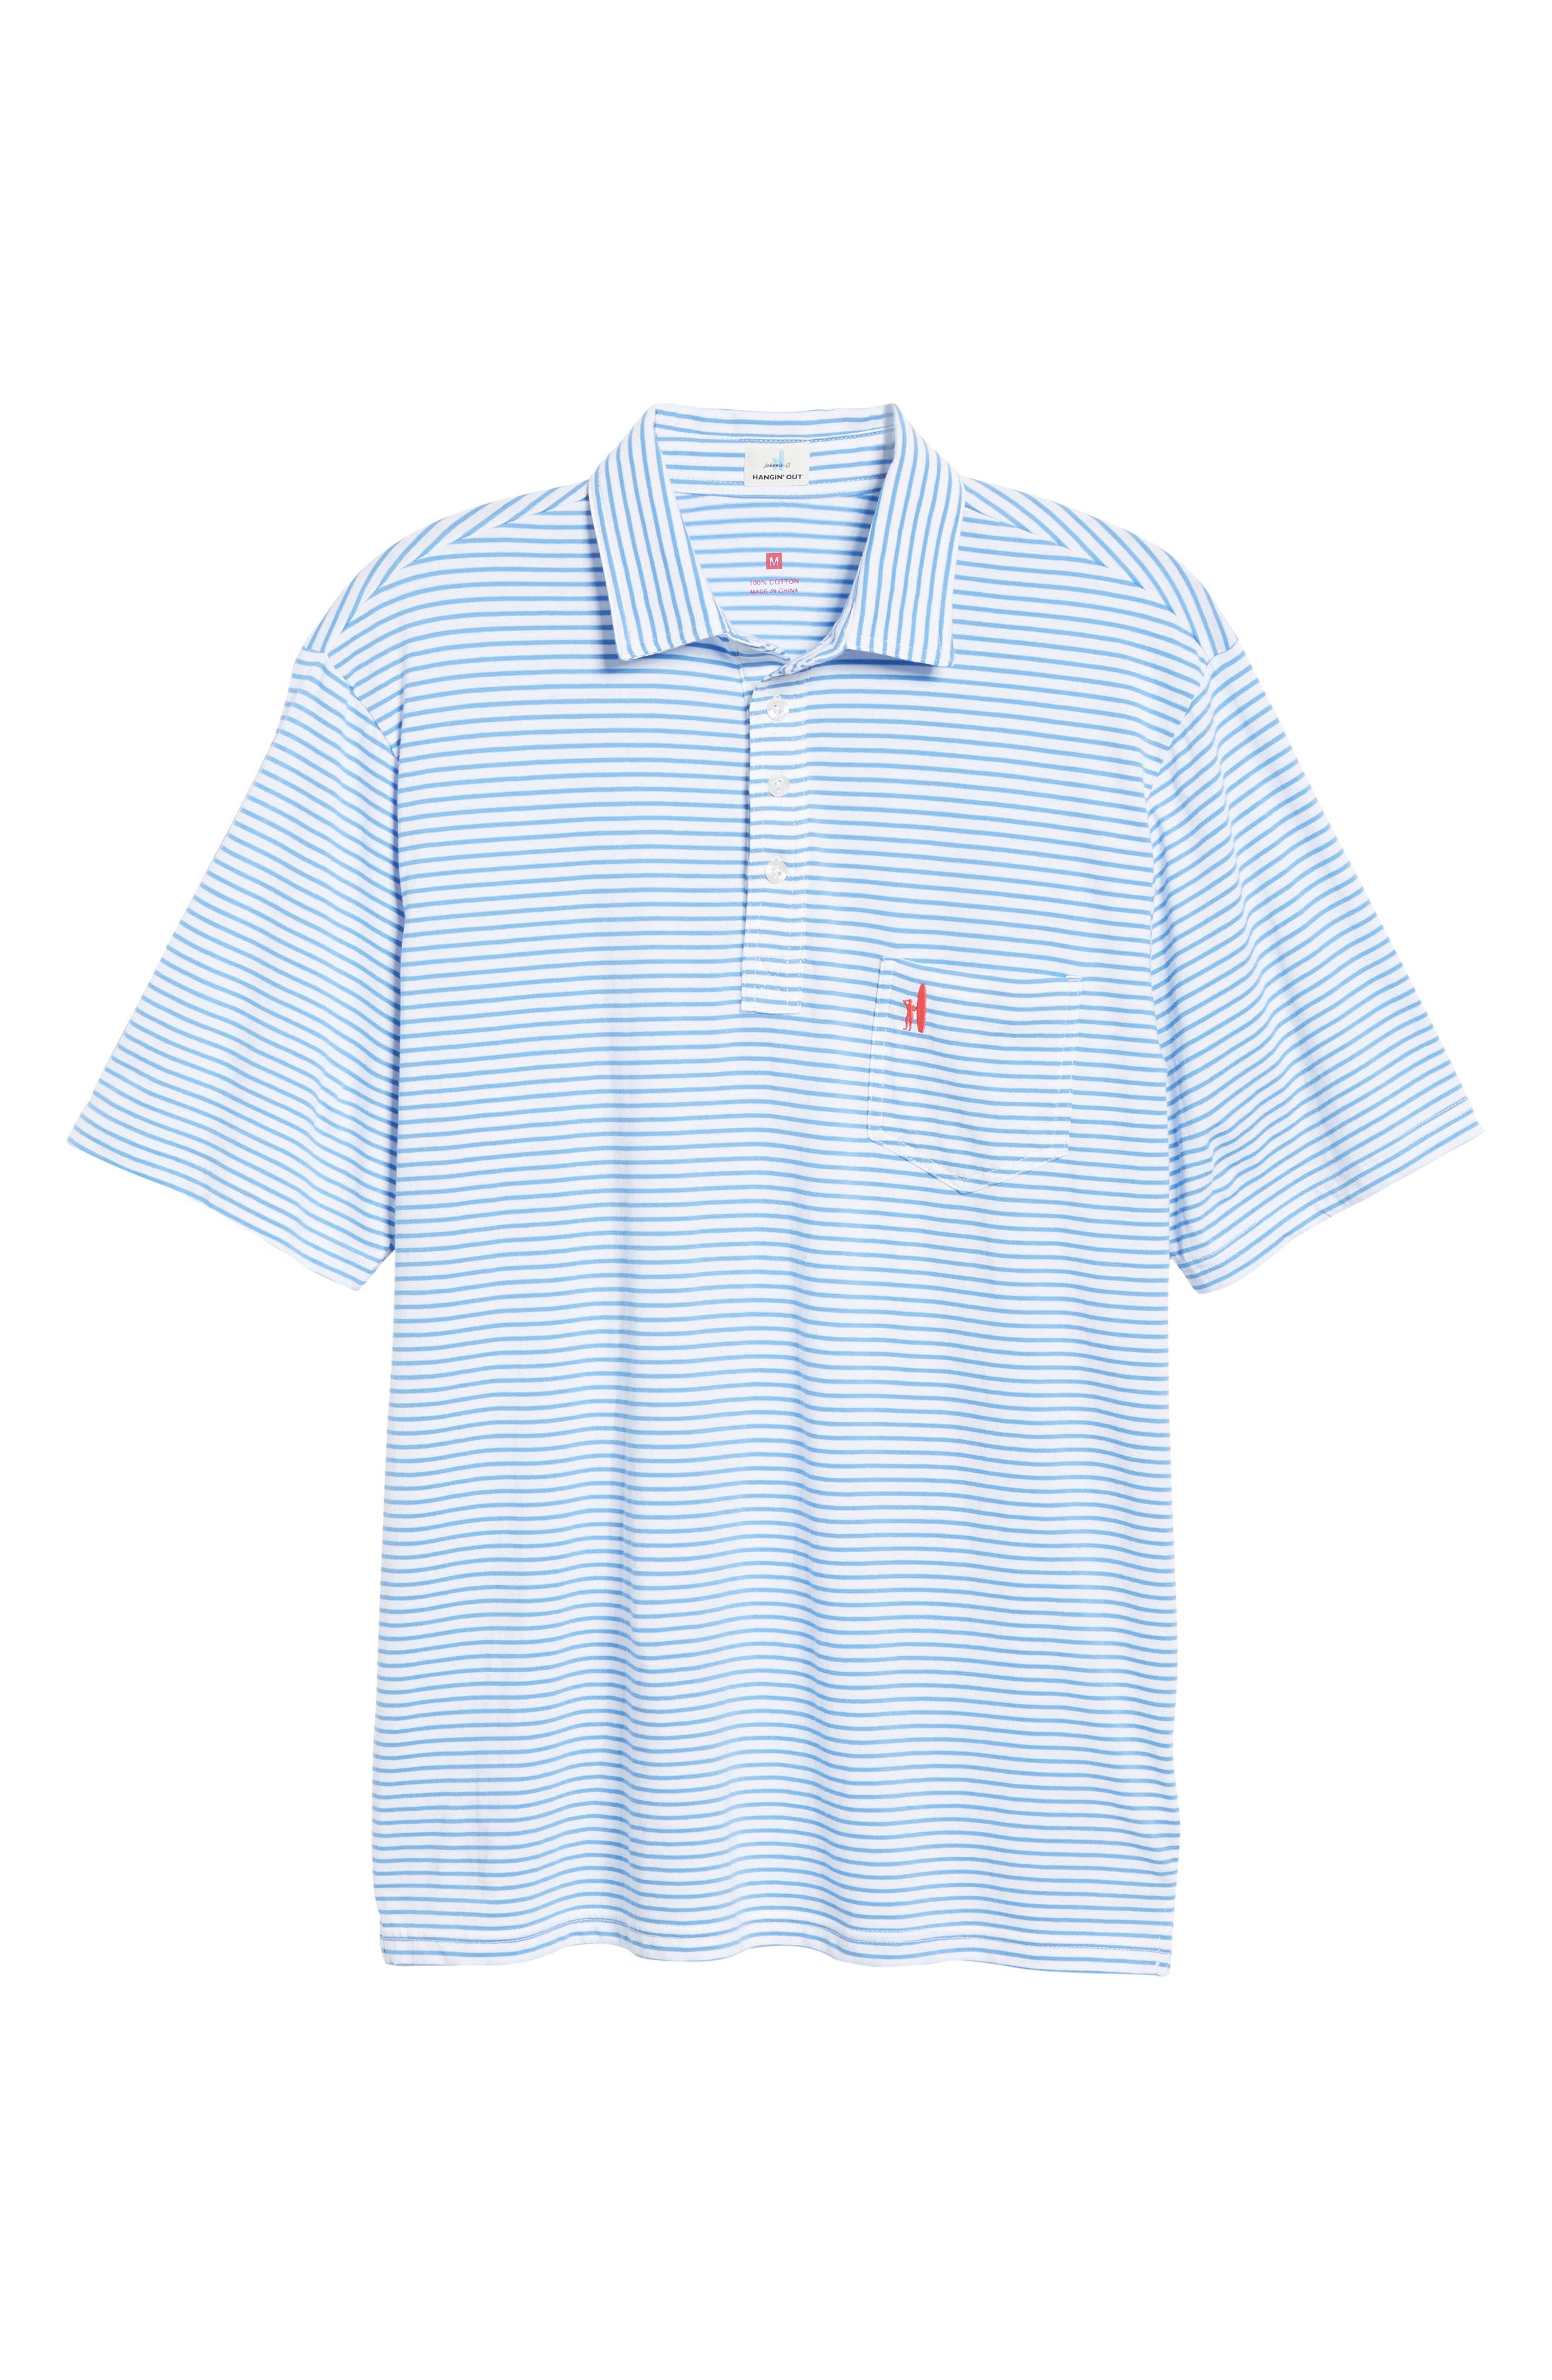 Macon Regular Fit Stripe Polo,                             Alternate thumbnail 6, color,                             WHITE